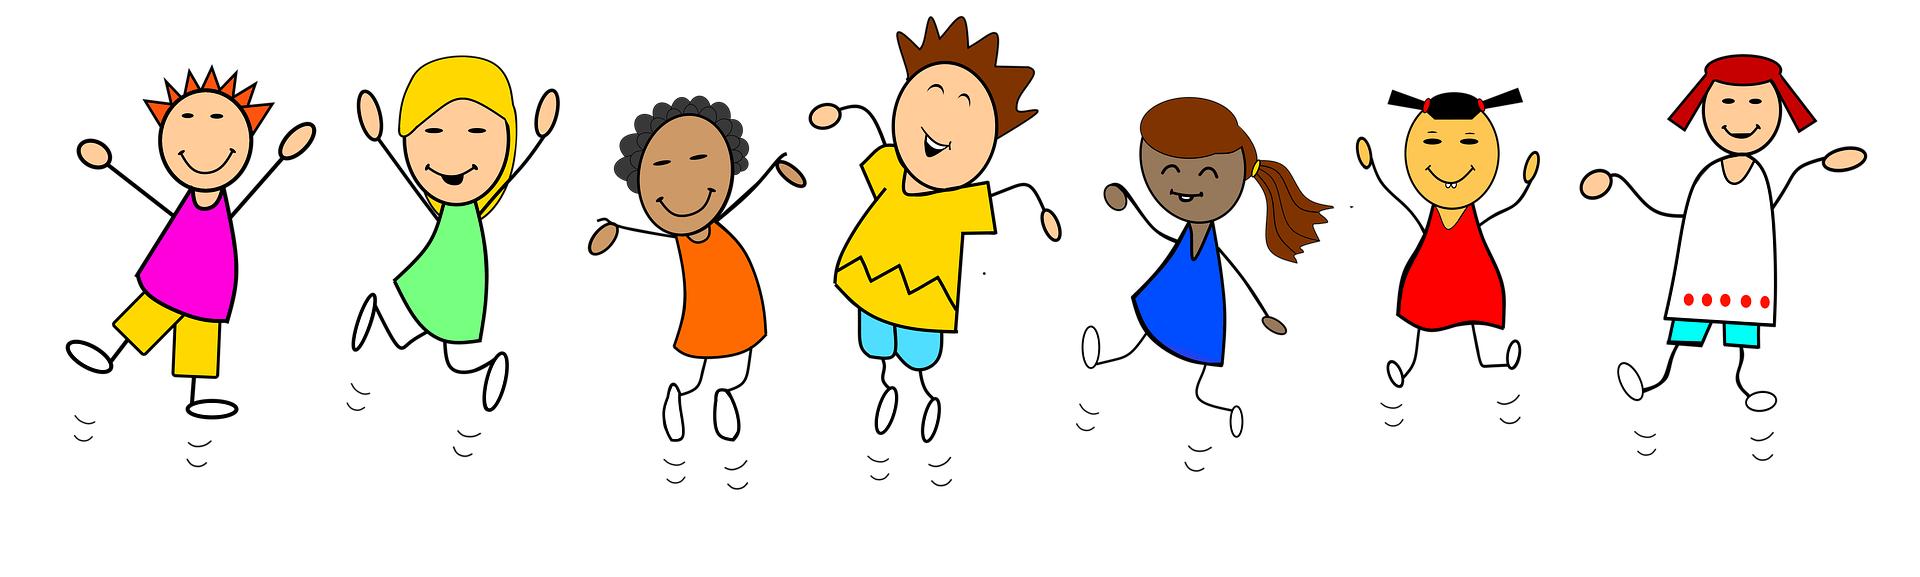 Freudige Kinder freie Pixabay